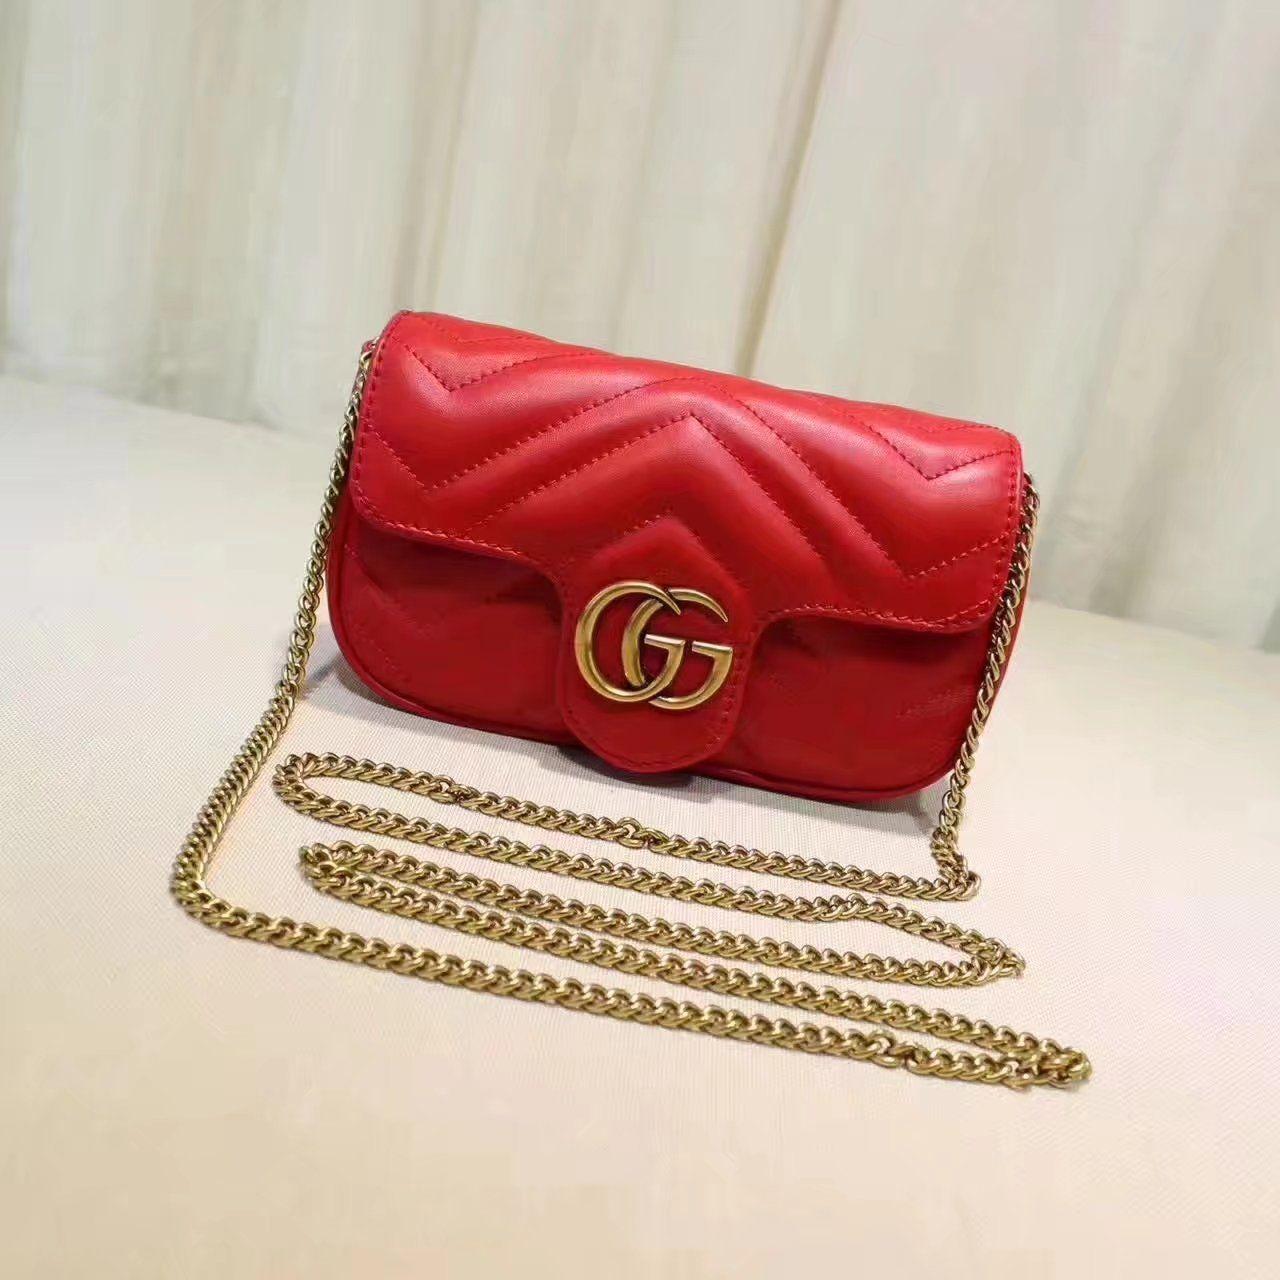 33962012bd13 Replica GUCCI GG Marmont matelasse leather super mini bag red ID:31678